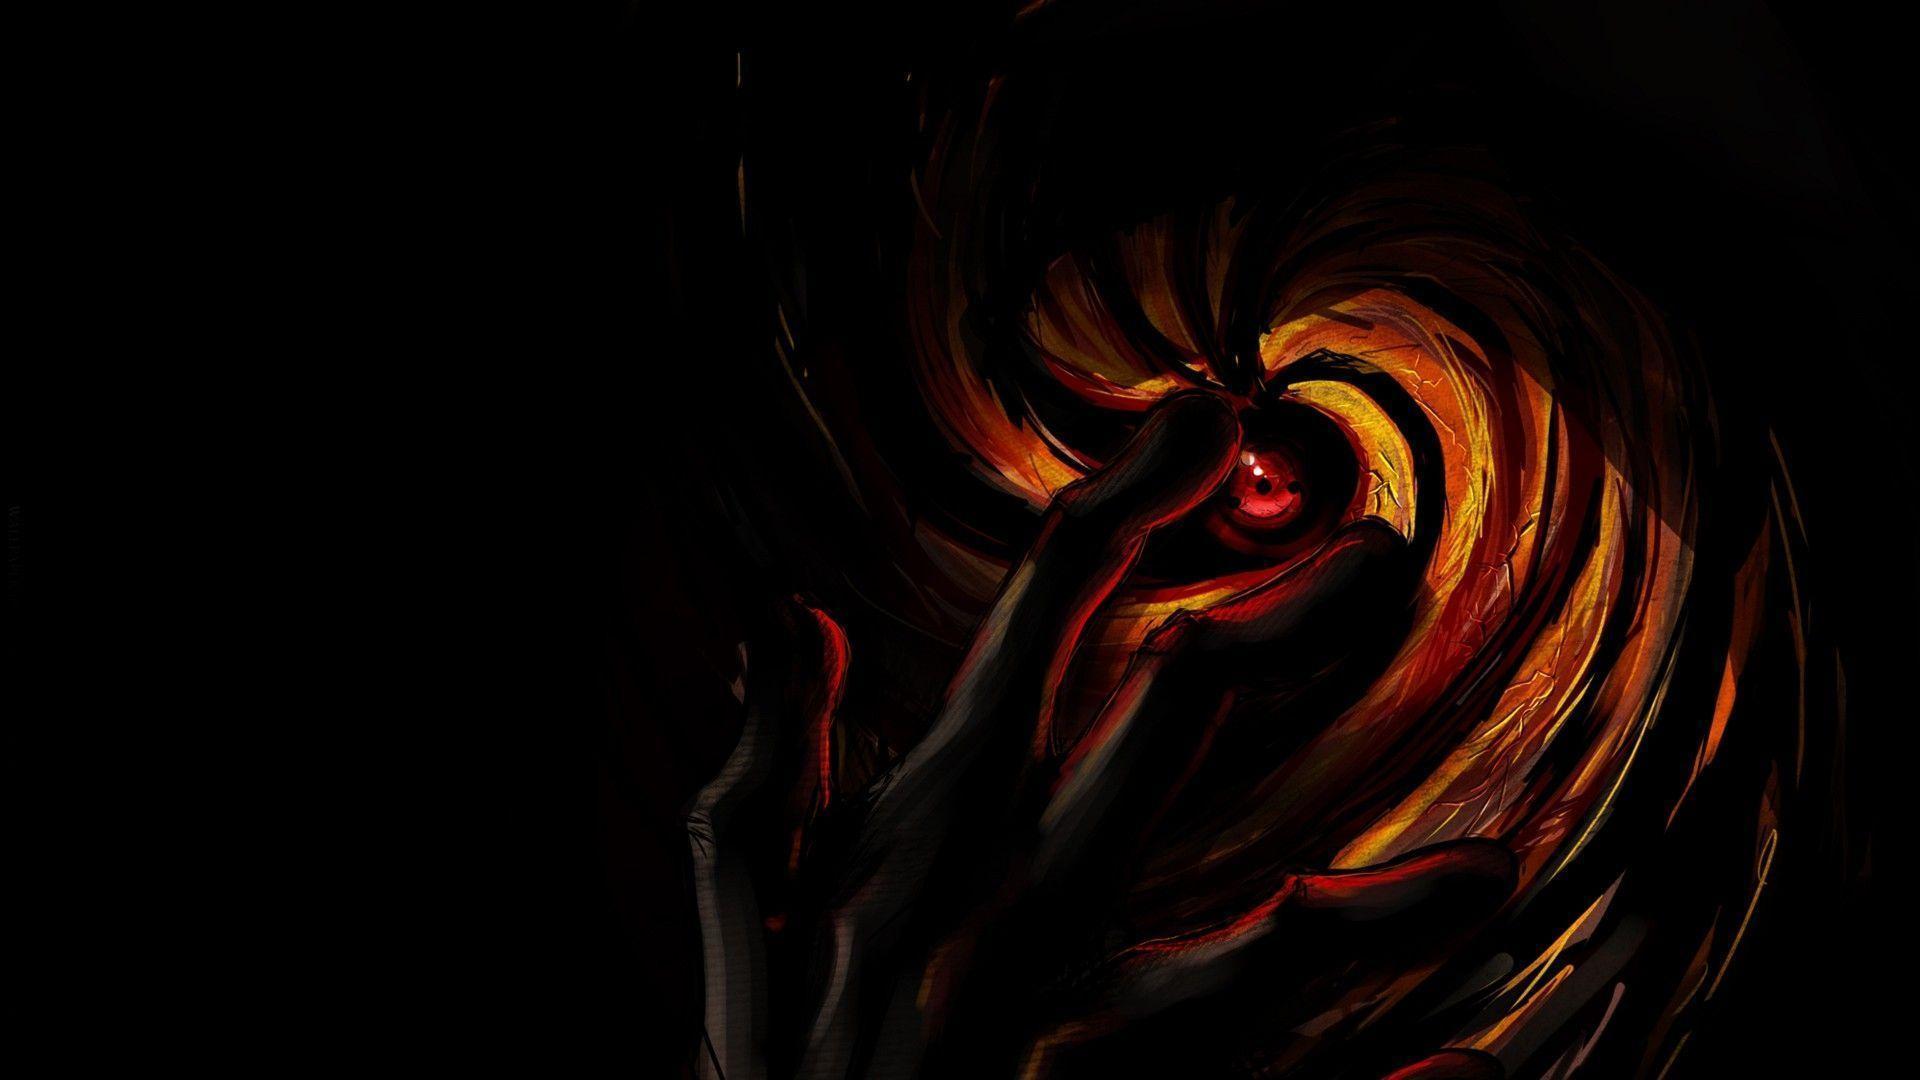 Naruto Tobi Wallpapers - Wallpaper Cave